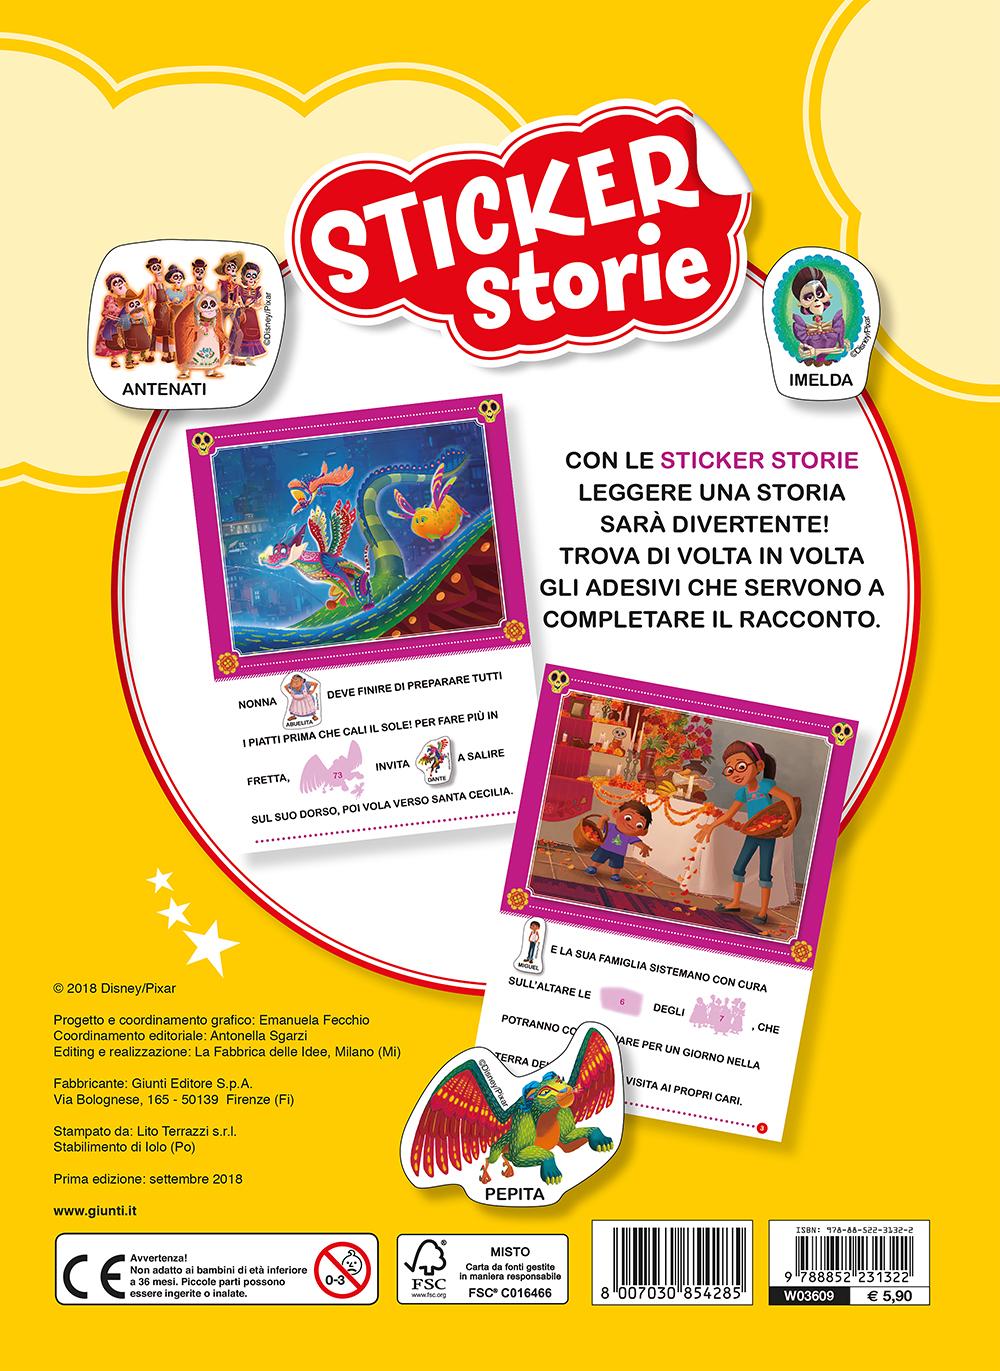 Sticker Storie - Coco